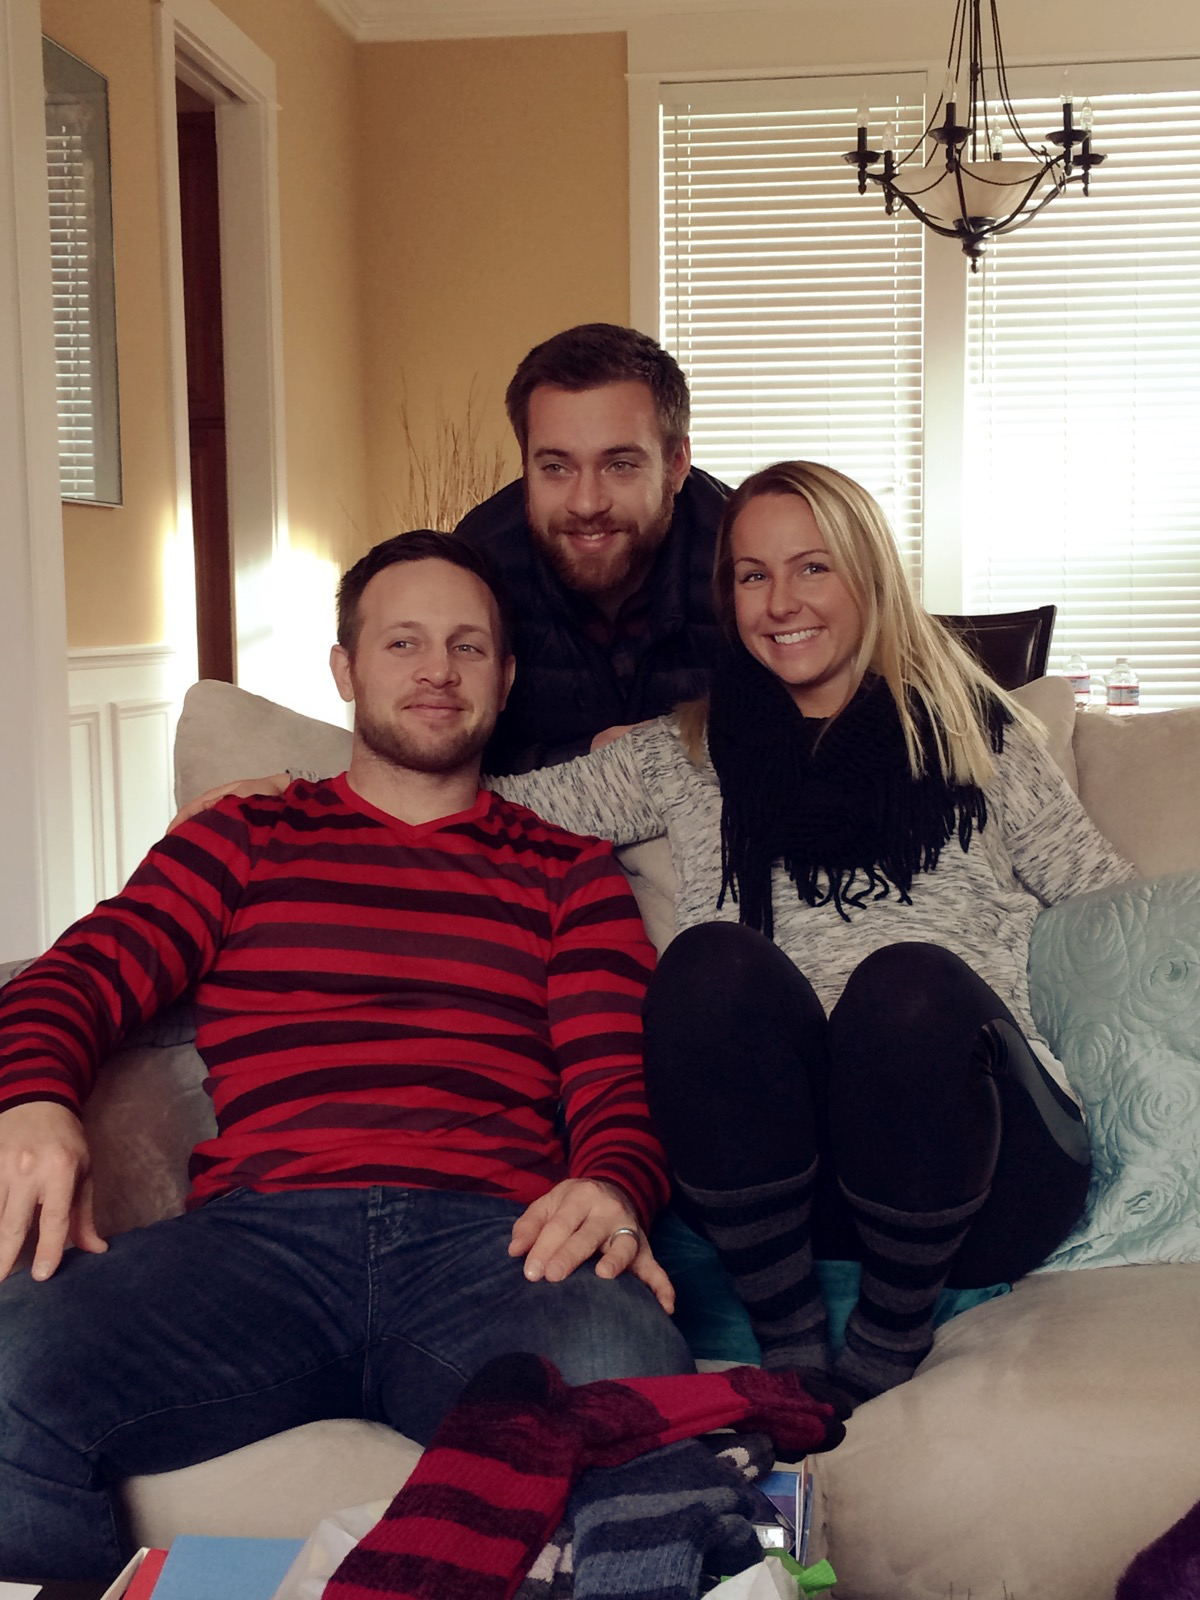 Robbie, Marsh, and Vanessa on Christmas